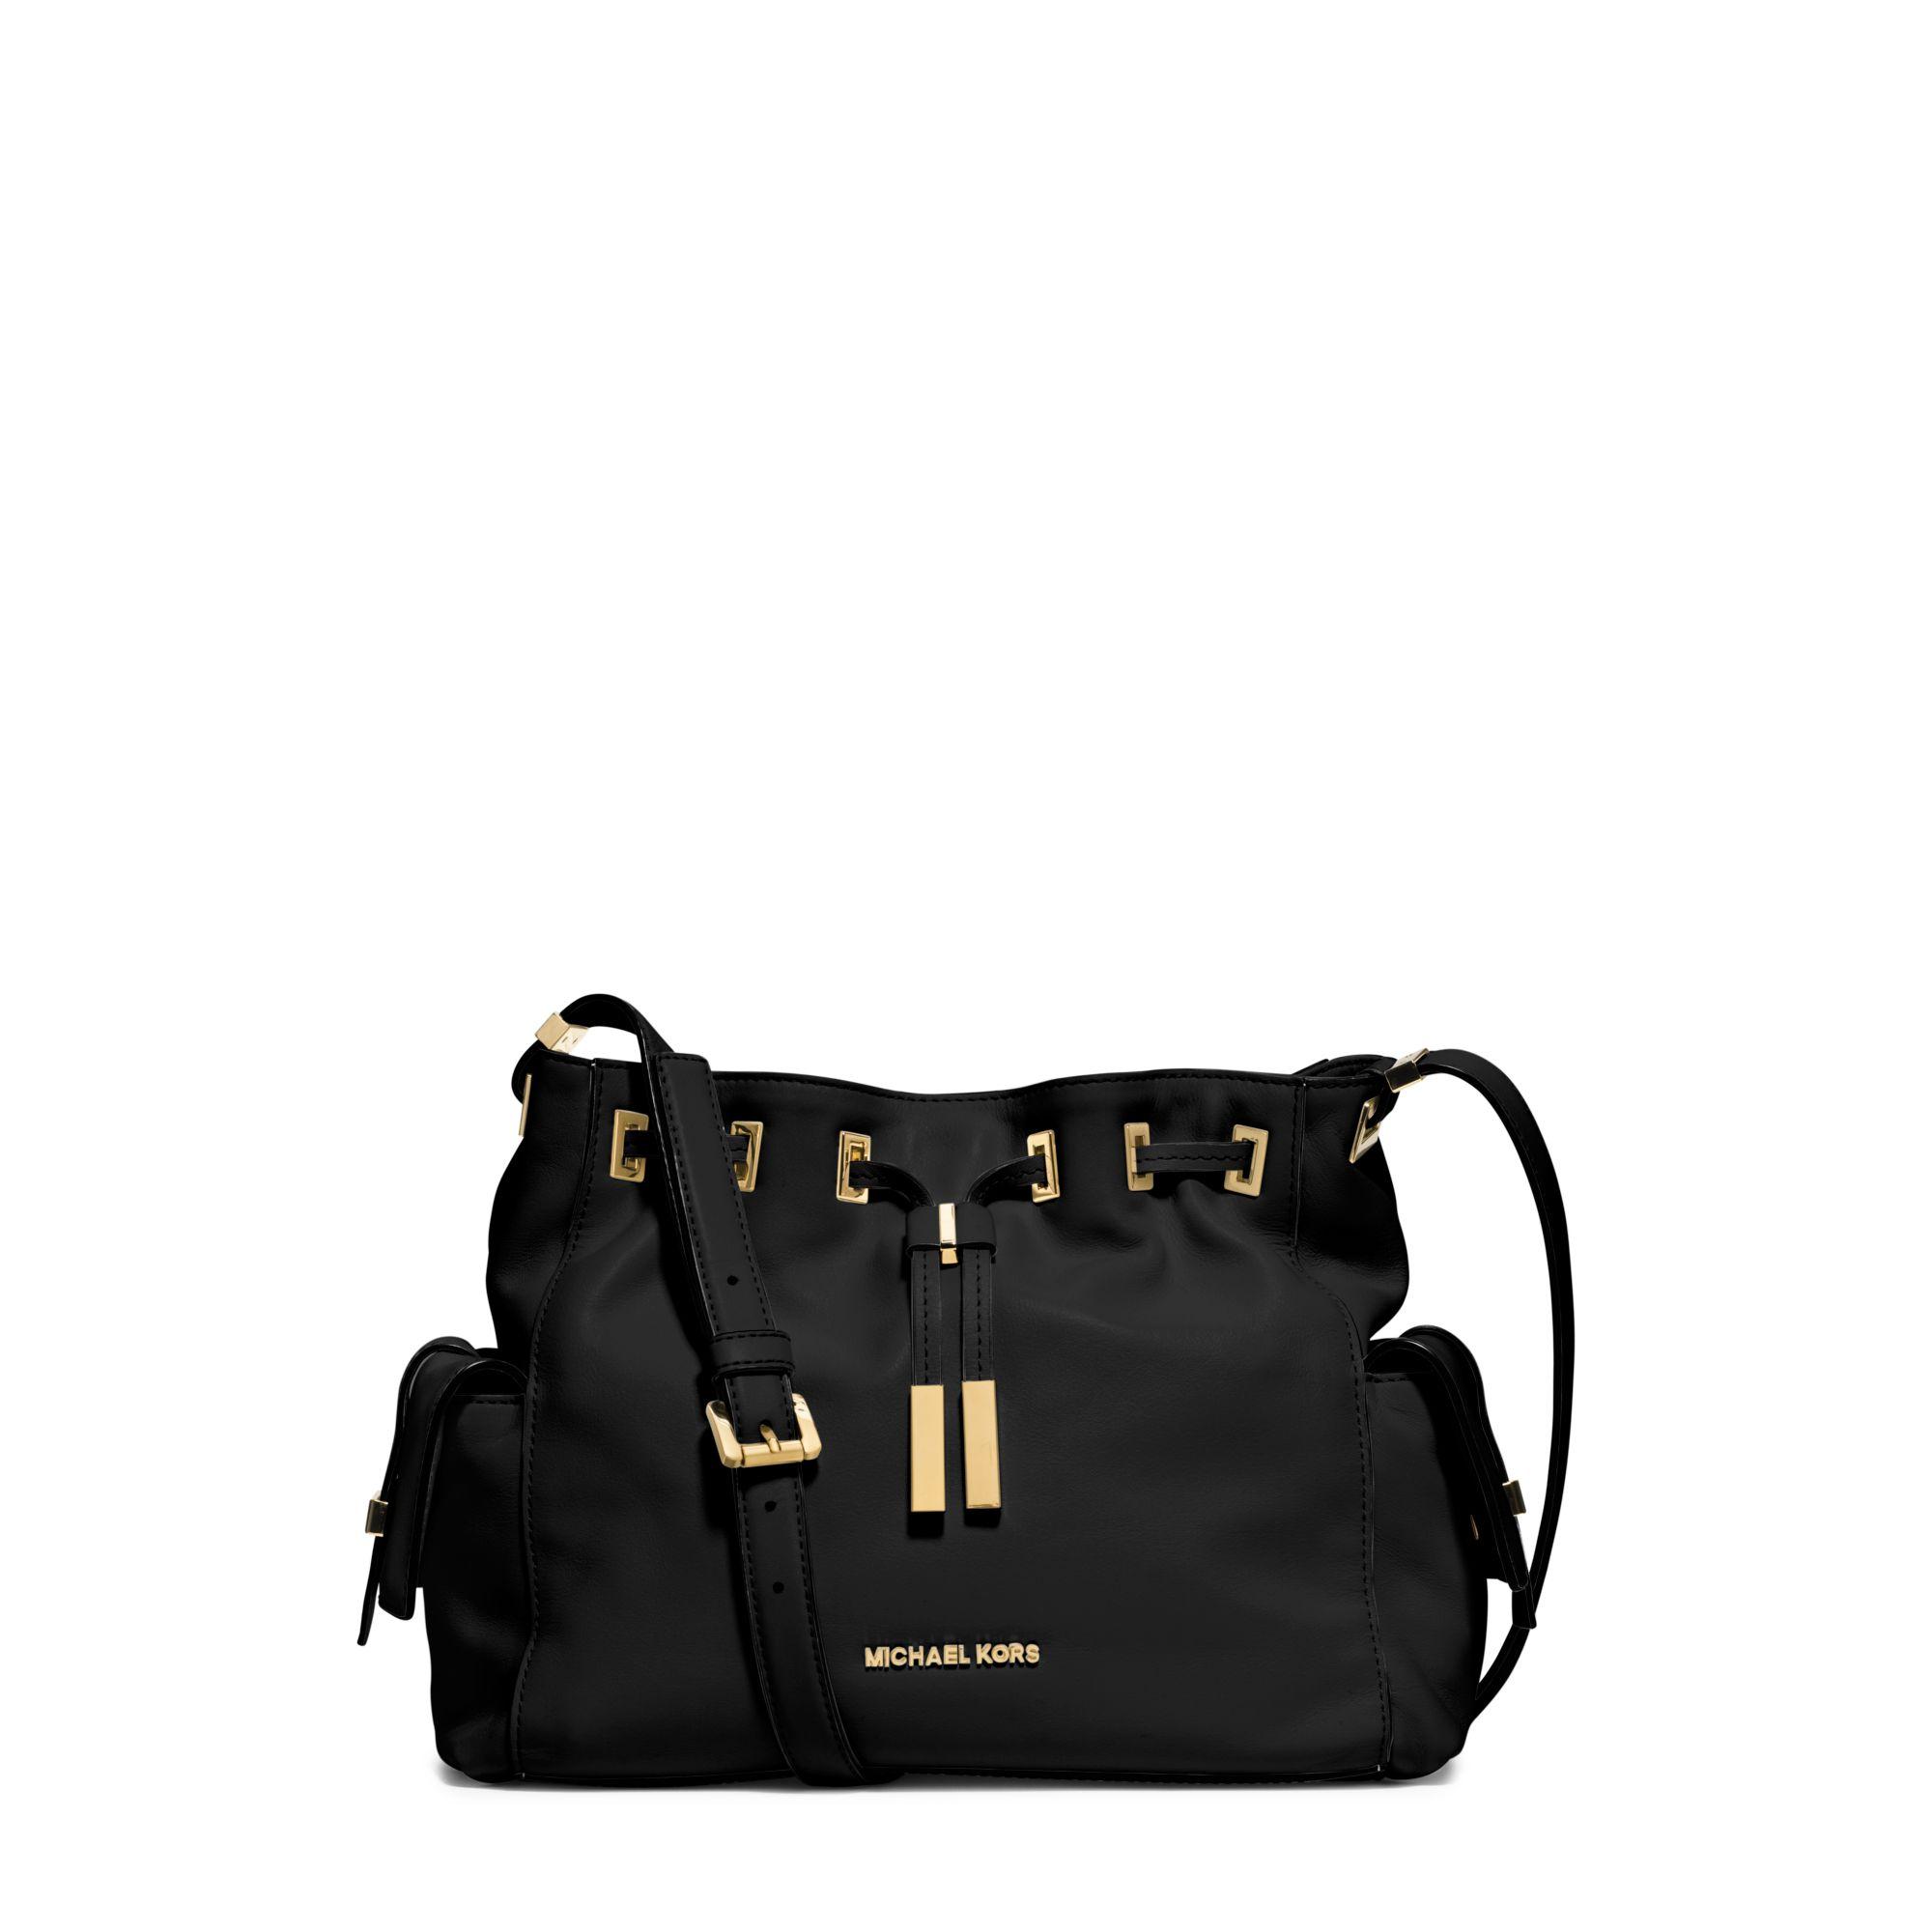 26865b3deefc ... Lyst - Michael Kors Marly Medium Drawstring Leather Messenge Michael  Michael Kors Chain Large Leather Shoulder Bag Michael Kors NEW Black White  ...